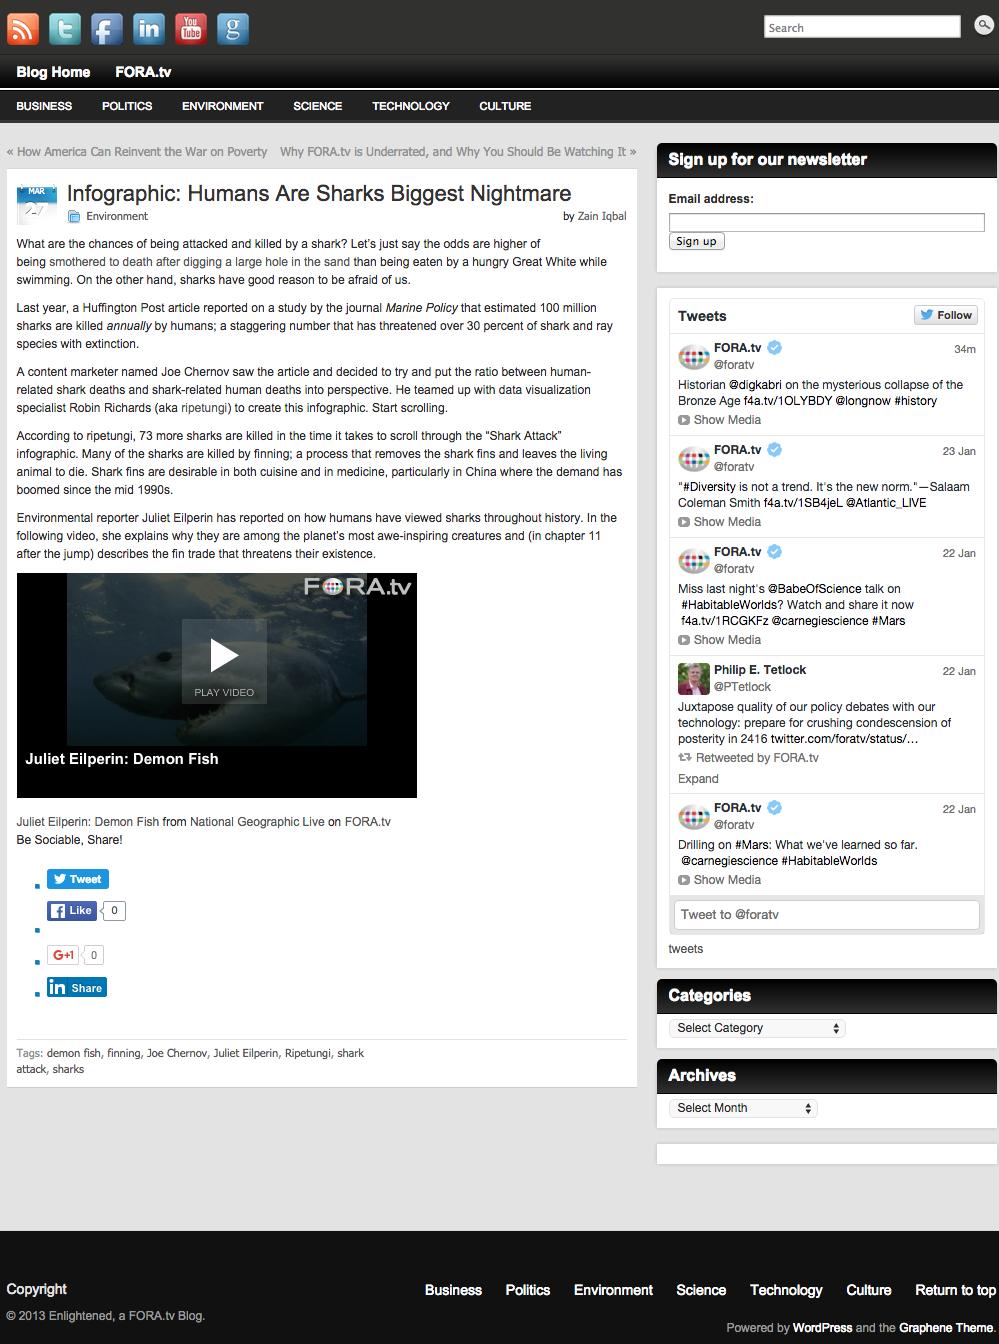 screencapture-enarchive-fora-tv-2014-03-humans-are-sharks-biggest-nightmare.png